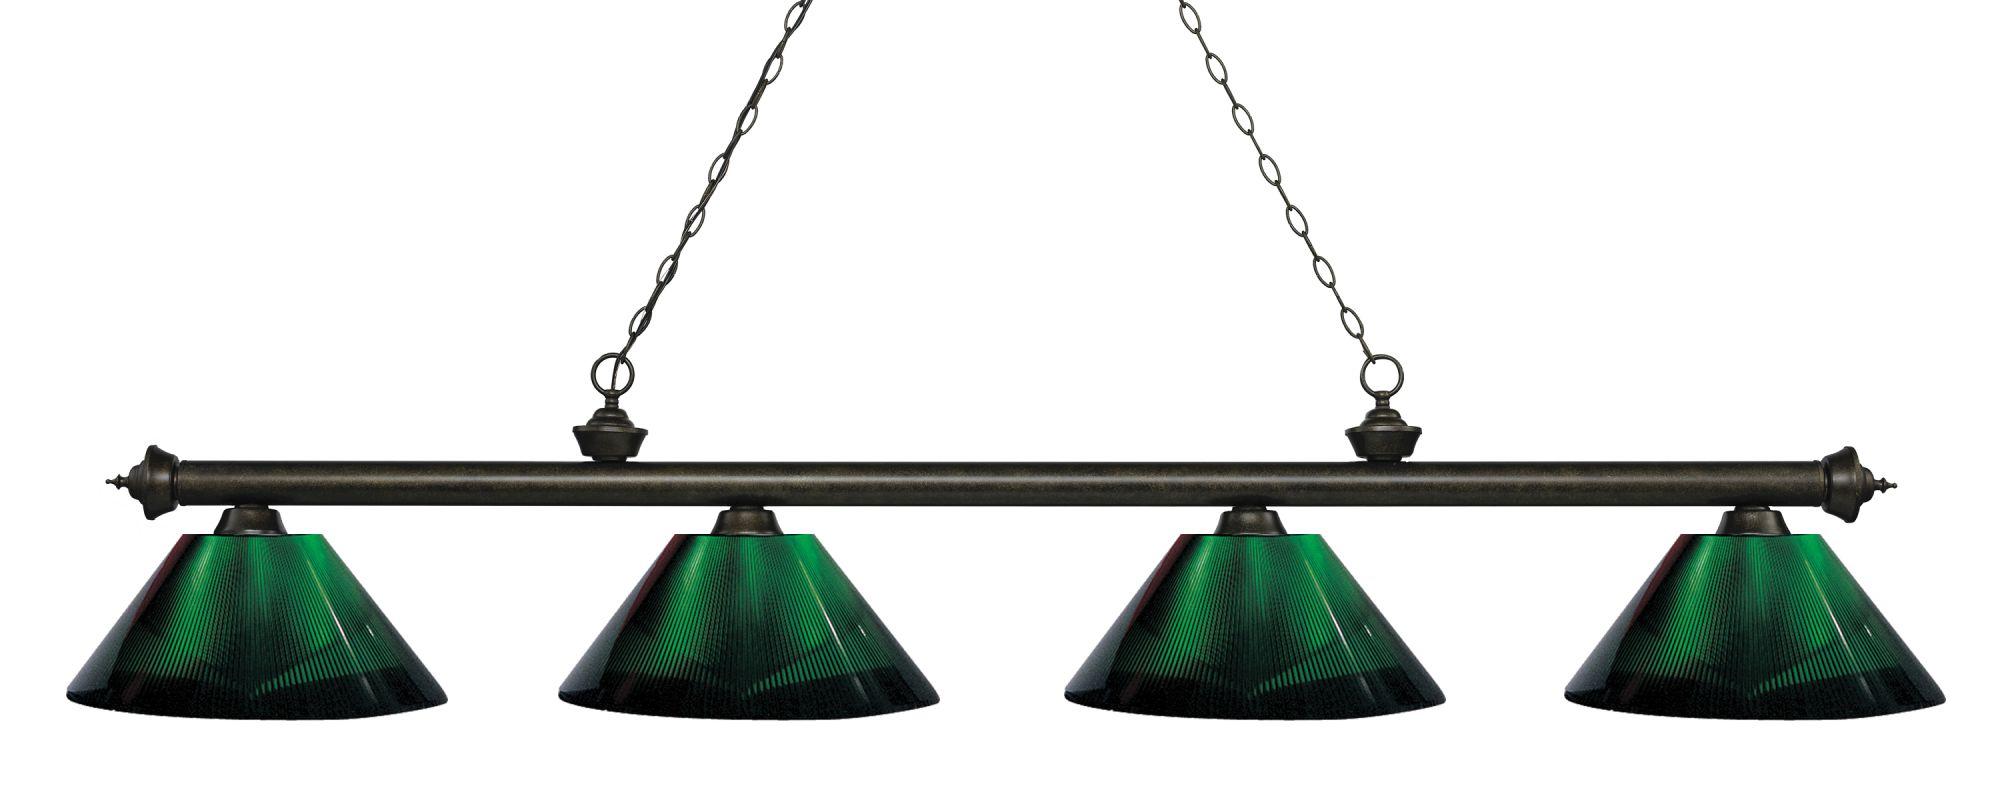 Z-Lite 200-4-ARG Riviera 4 Light Island/Billiard Light with Green Sale $366.00 ITEM: bci2758240 ID#:200-4GB-ARG UPC: 685659059397 :